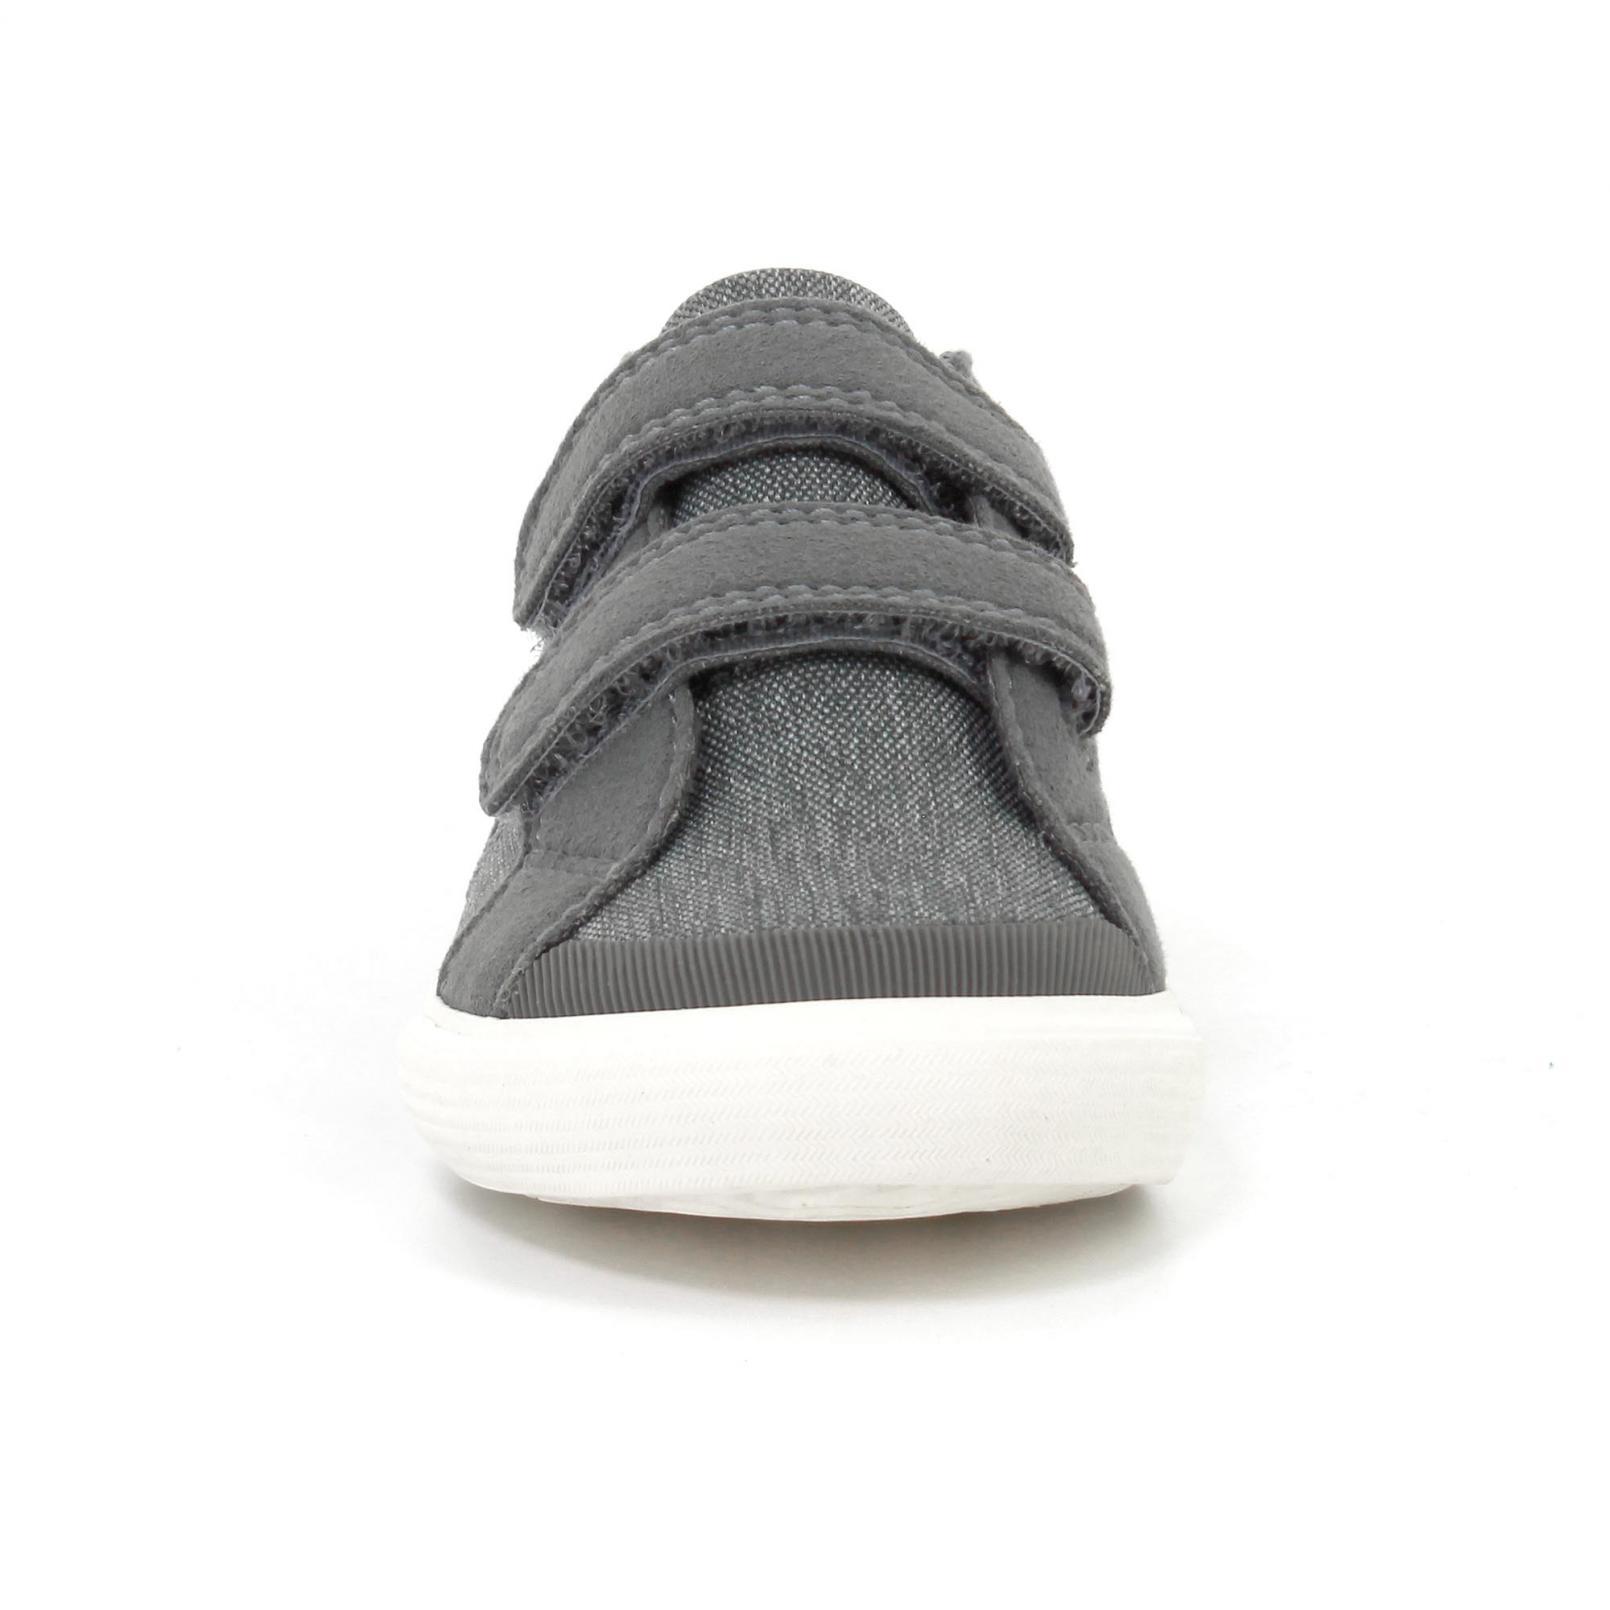 Shoes – Le Coq Sportif Saint Gaetan Inf 2 Tones Grey